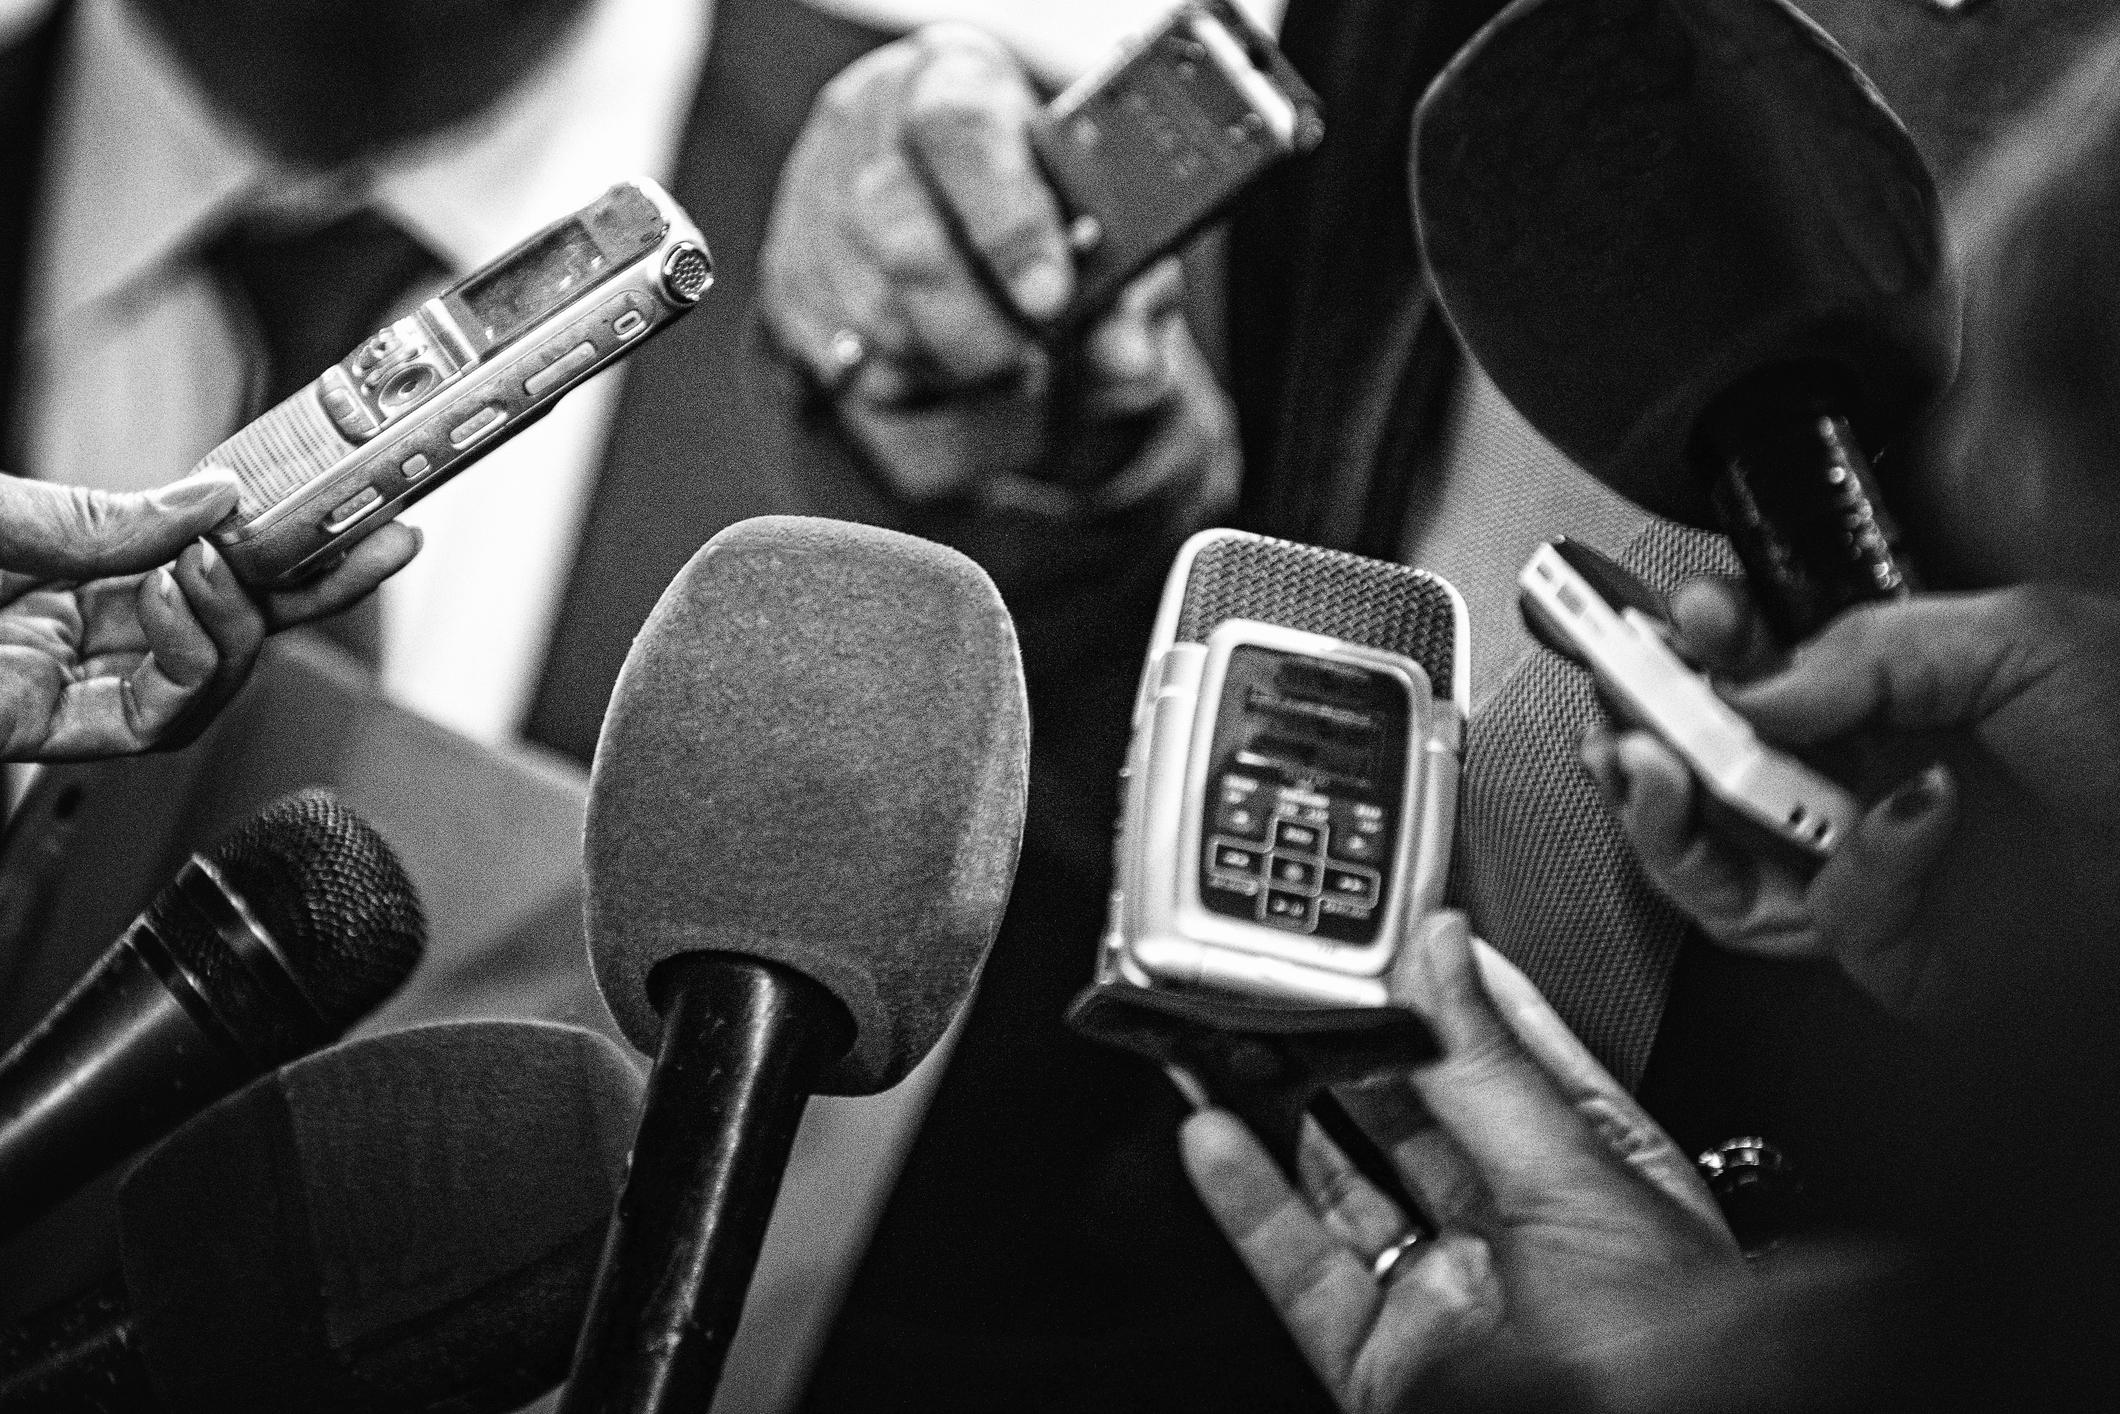 Projeto que inclui jornalista como microempreendedor individual segue para Câmara